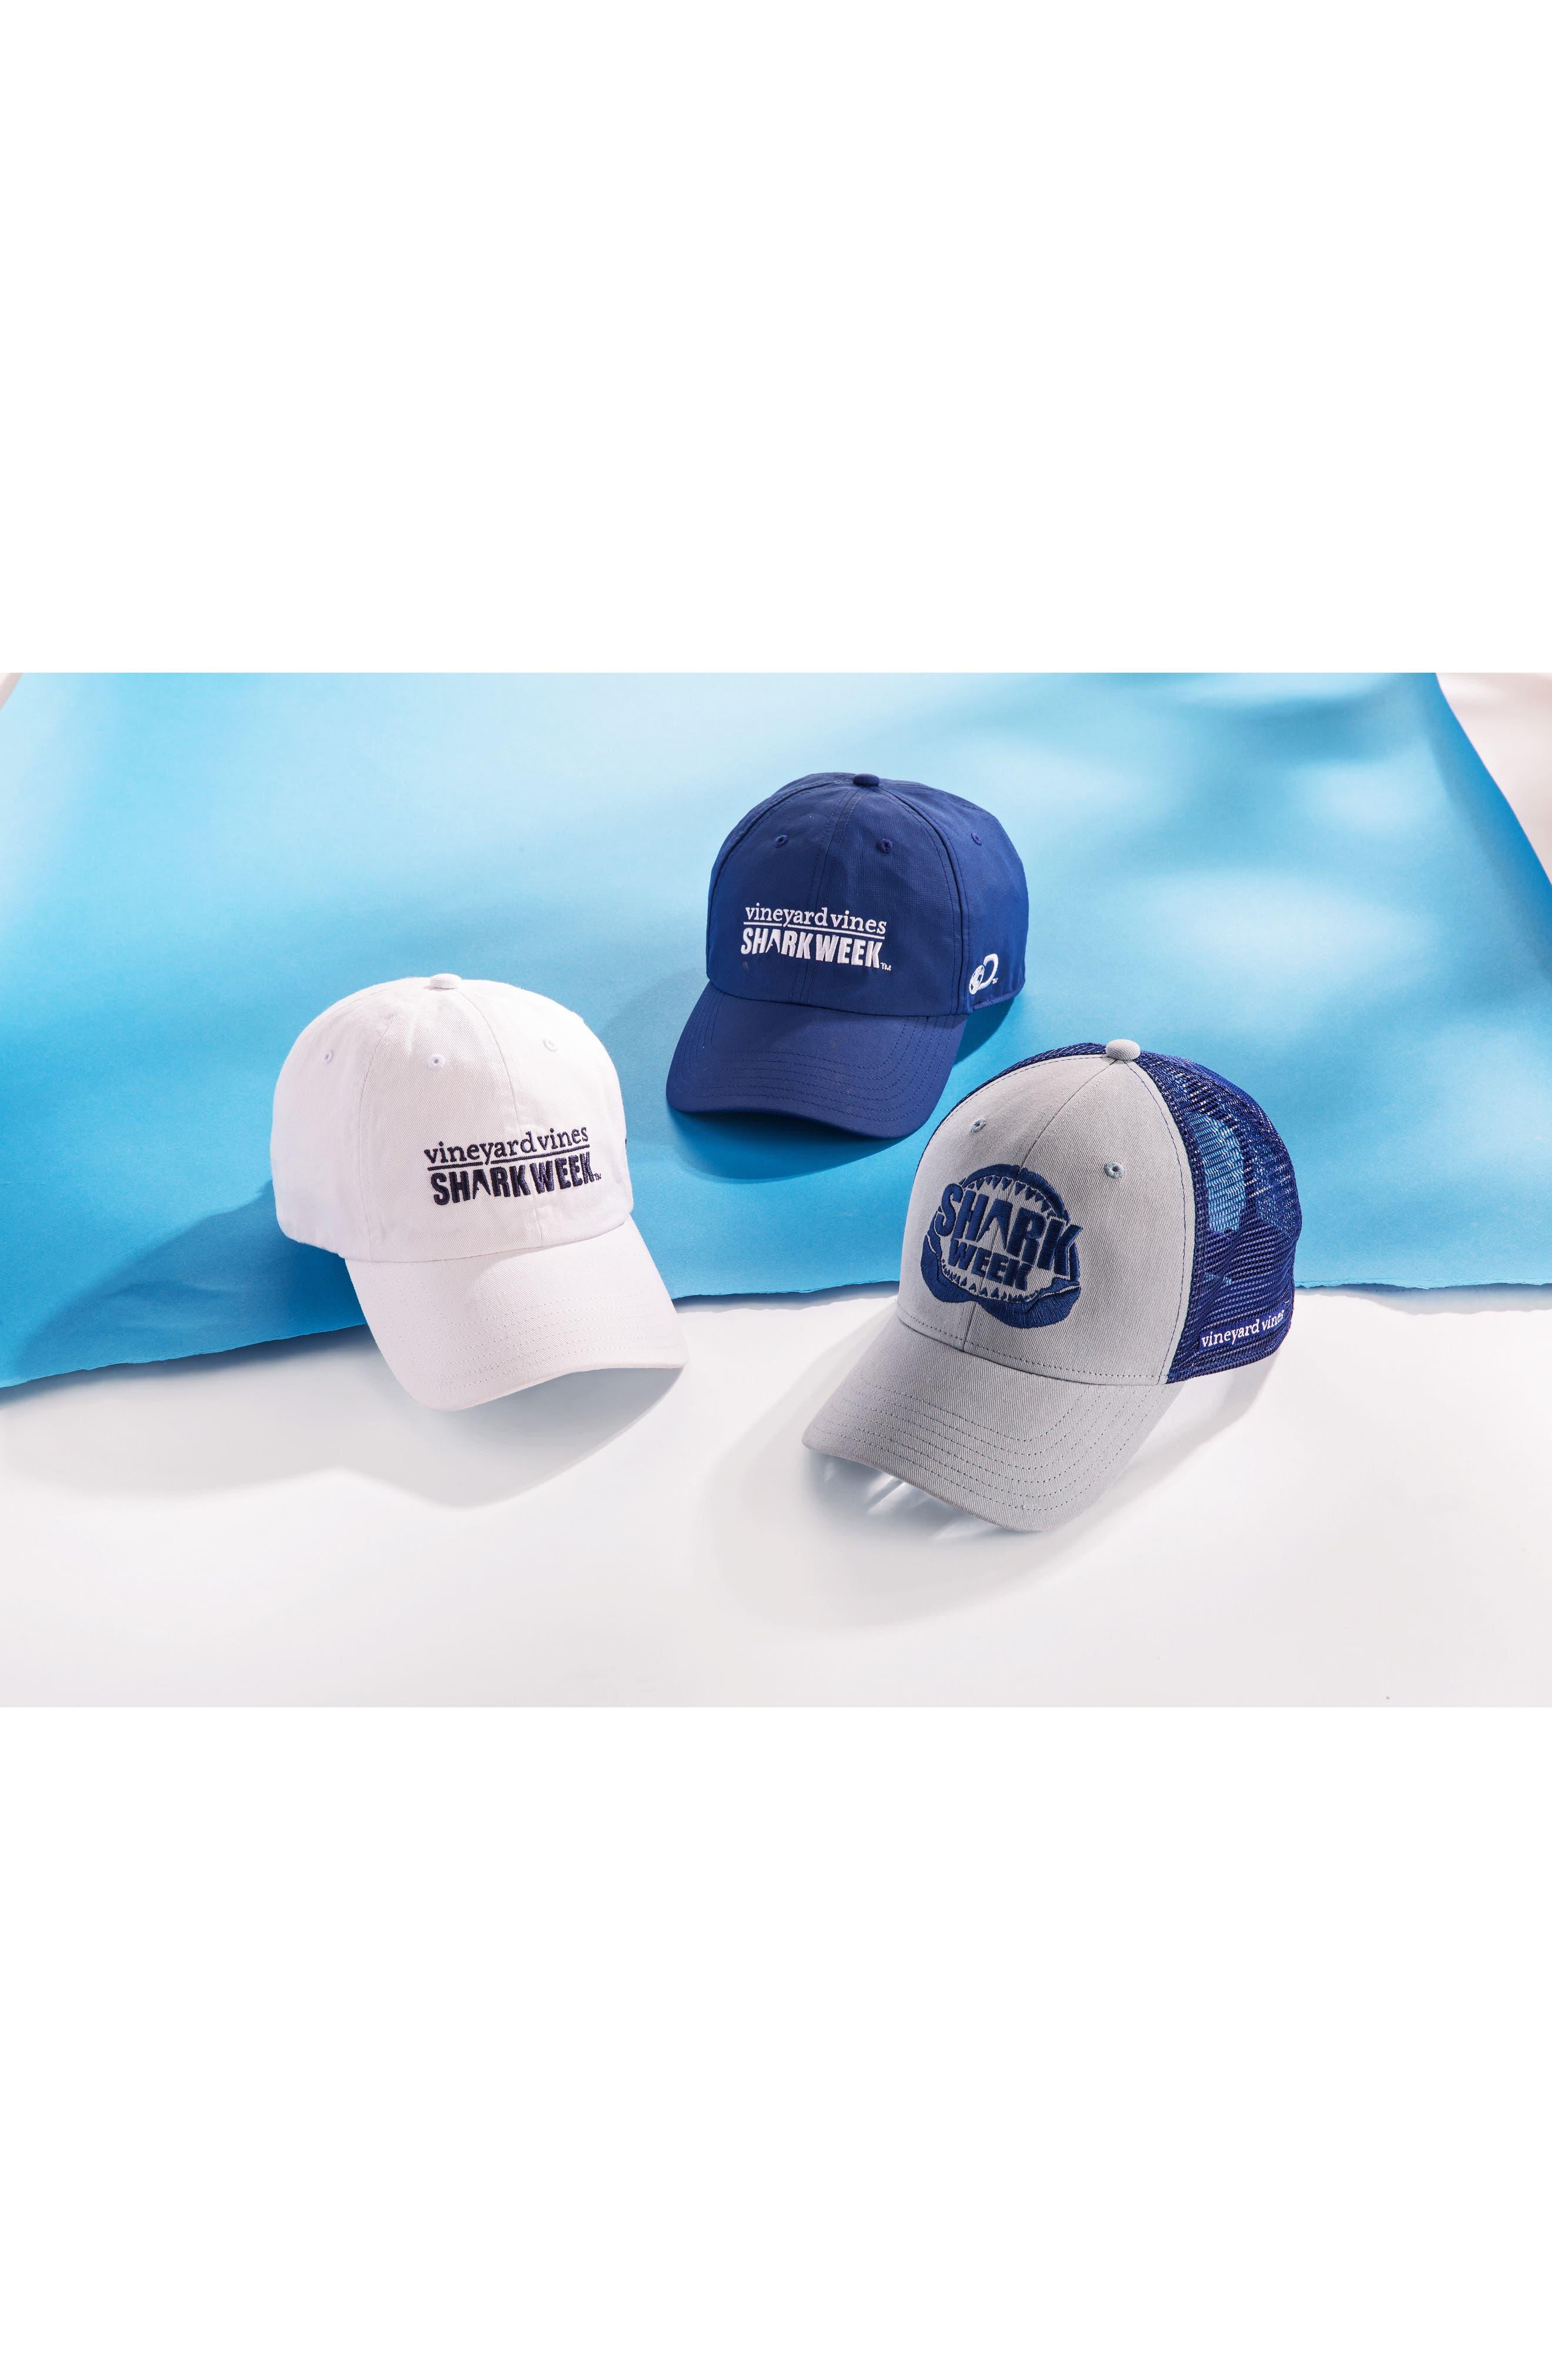 x Shark Week<sup>™</sup> Logo Baseball Cap,                             Alternate thumbnail 4, color,                             White Cap